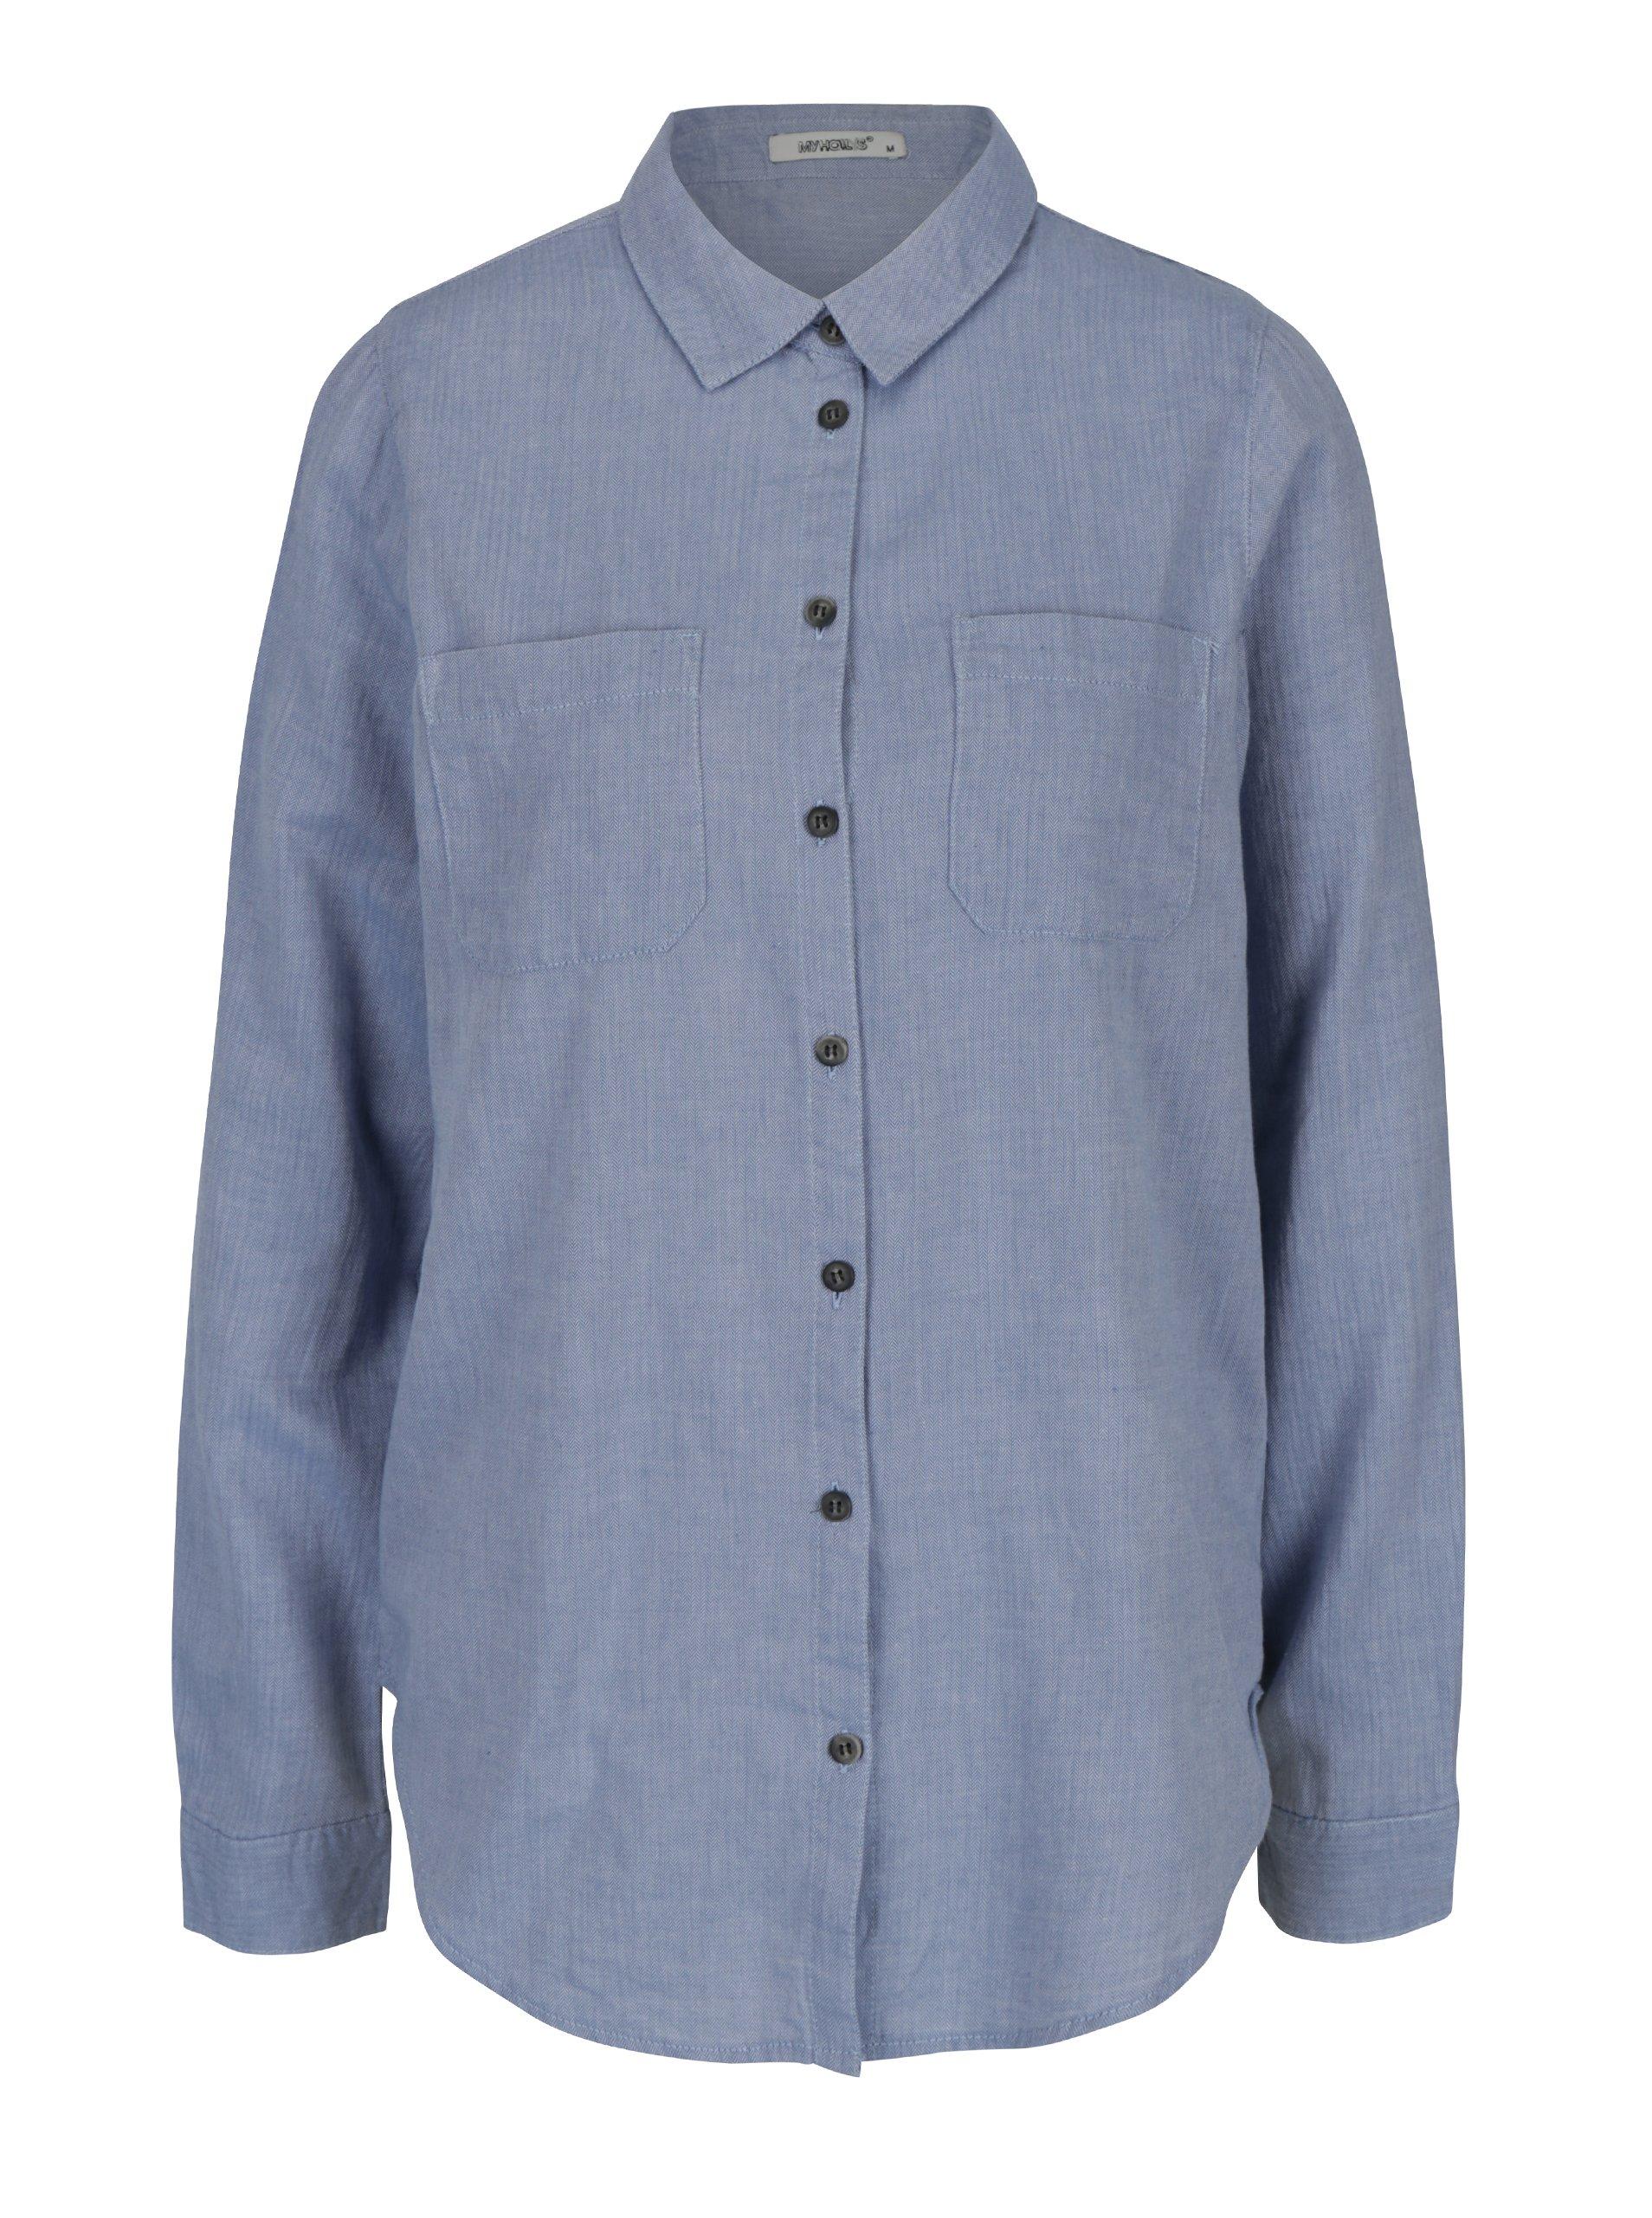 Modrá košile s výšivkou na zádech Haily´s Betty